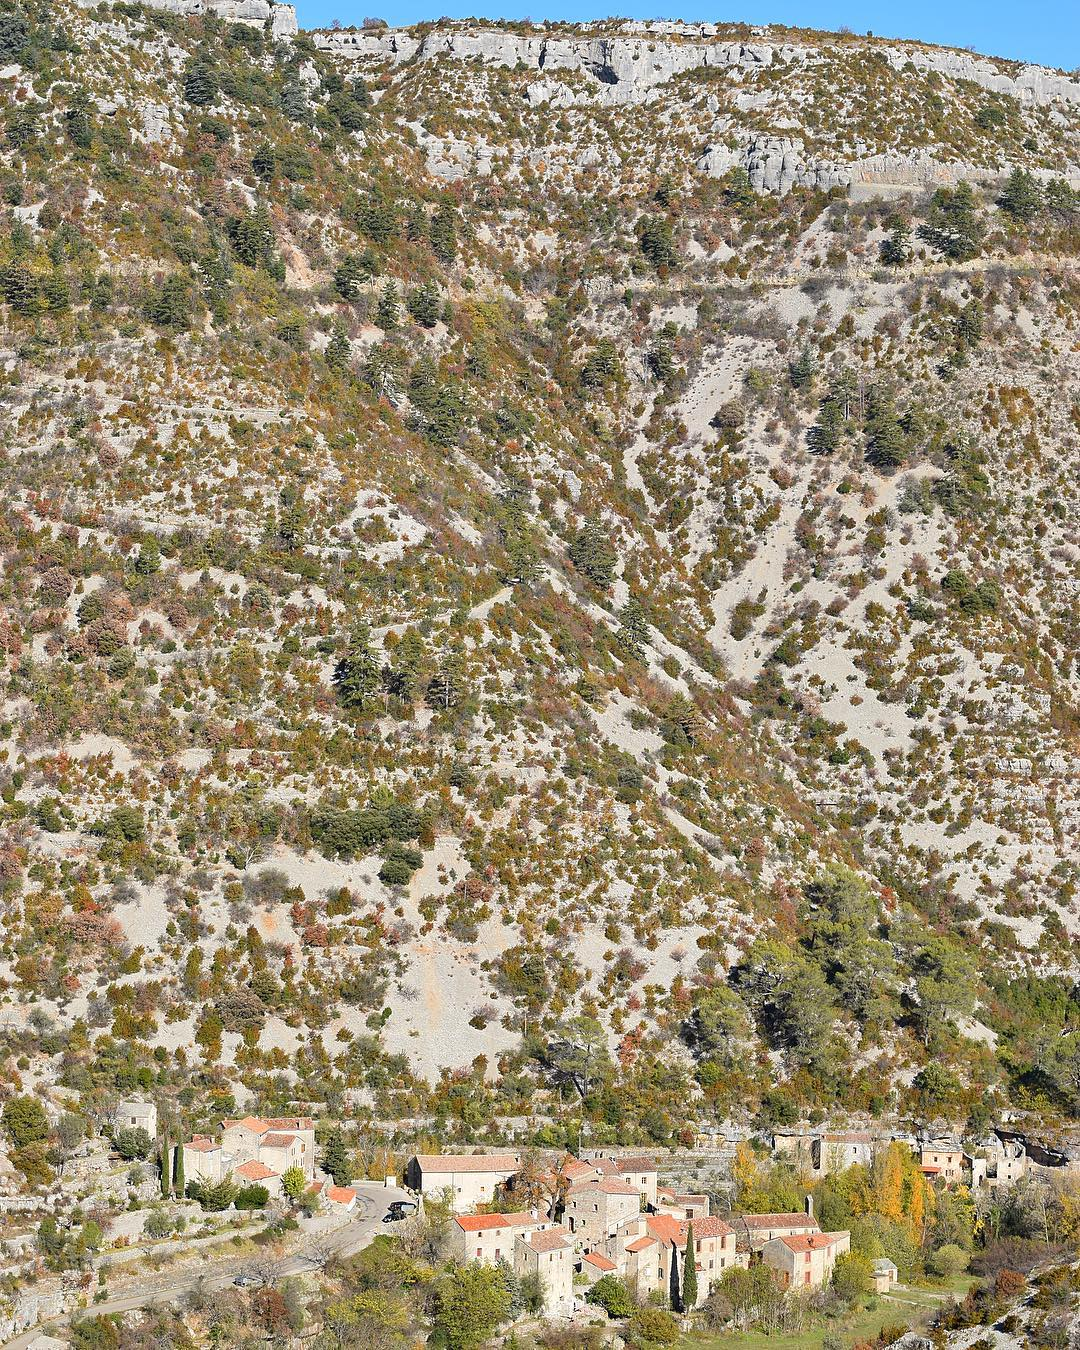 Où est le village ? ⛰ Impressionnant CIRQUE DE NAVACELLES ! . . . ➕ Cirque de NAVACELLES . ? Navacelles (34)?? ________________ #cirquedenavacelles #occitanie #travel #voyage #travelblog #blogvoyage #travelblogger #montpellier #pintademontpellier